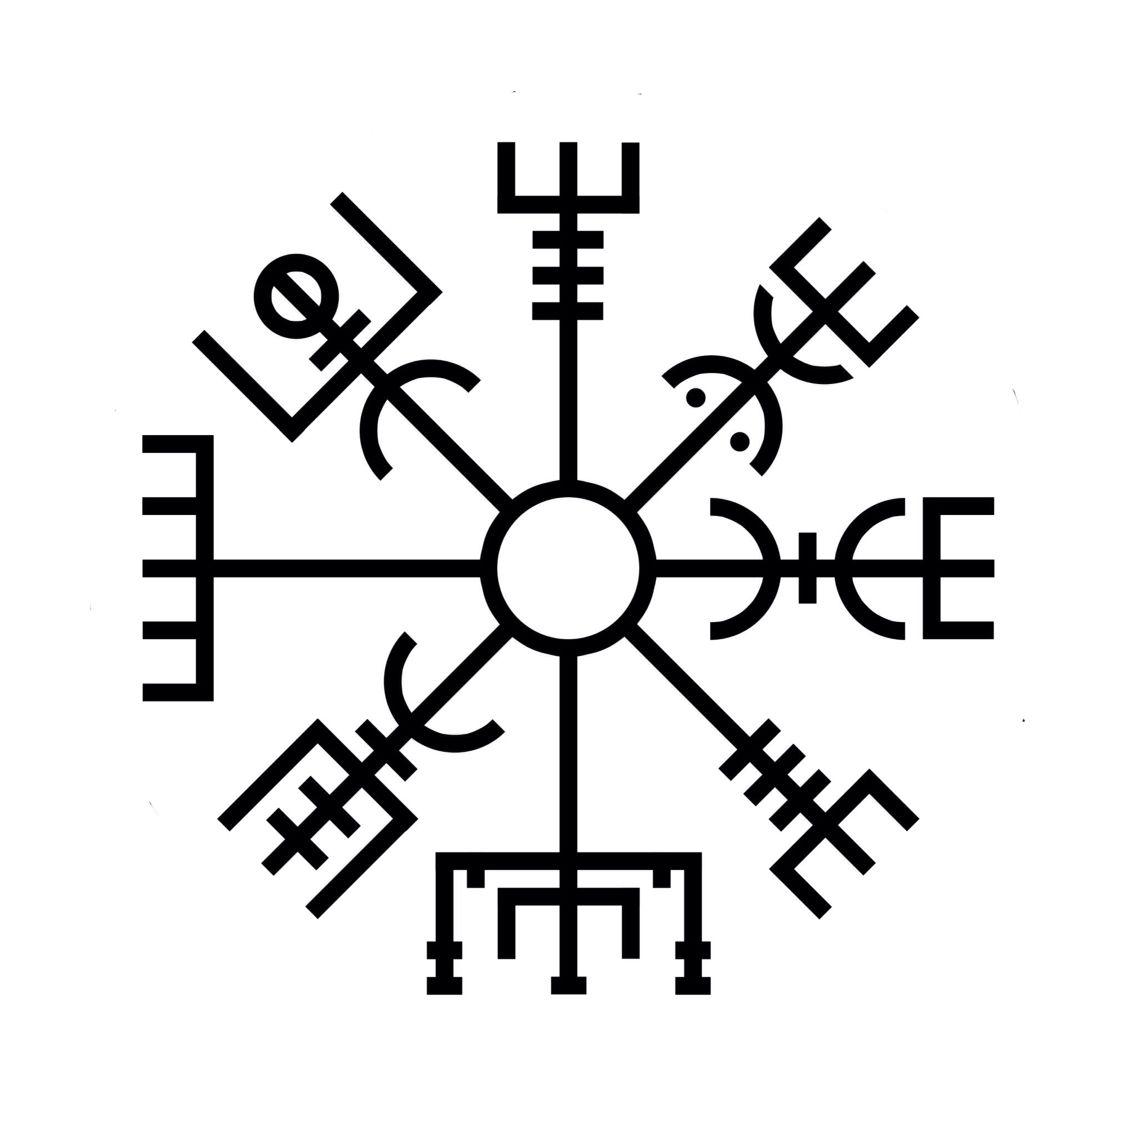 Norwegian symbols and meanings tattoos choice image symbol and vegvisir tattoos i want pinterest vikings and tattoo tattoo buycottarizona biocorpaavc